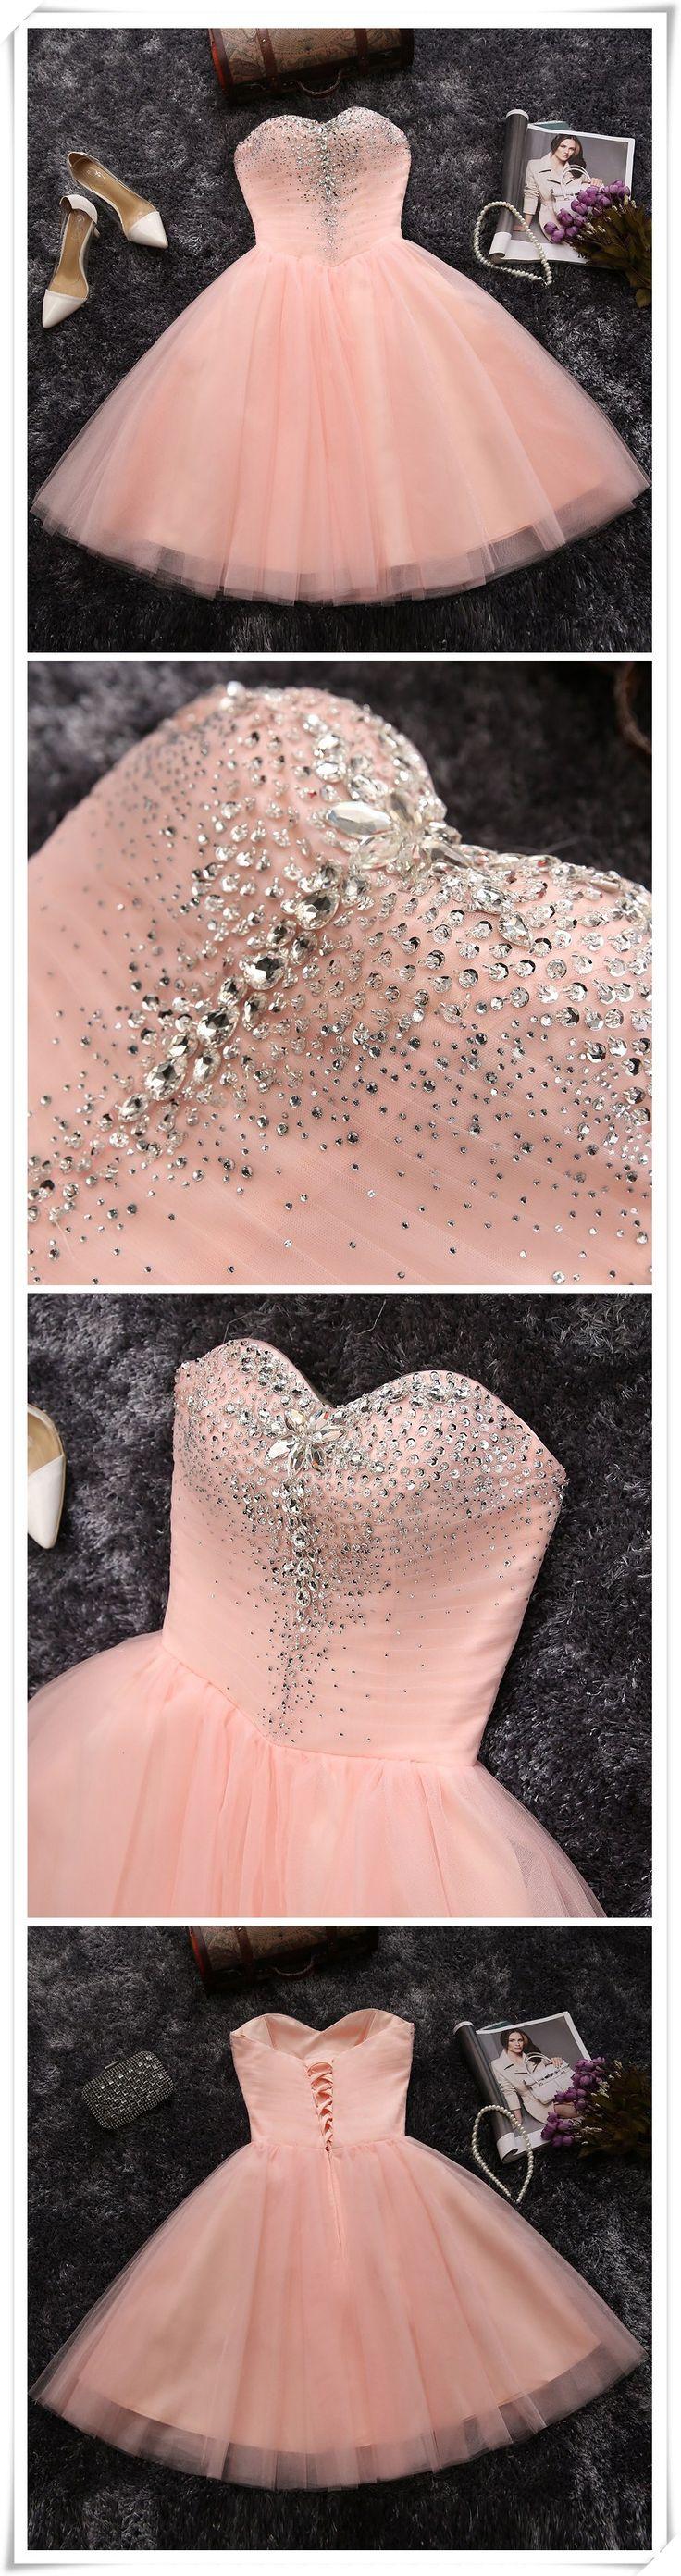 PINK A-LINE SWEETHEART SHORT PROM DRESS JUNIORS HOMECOMING DRESS